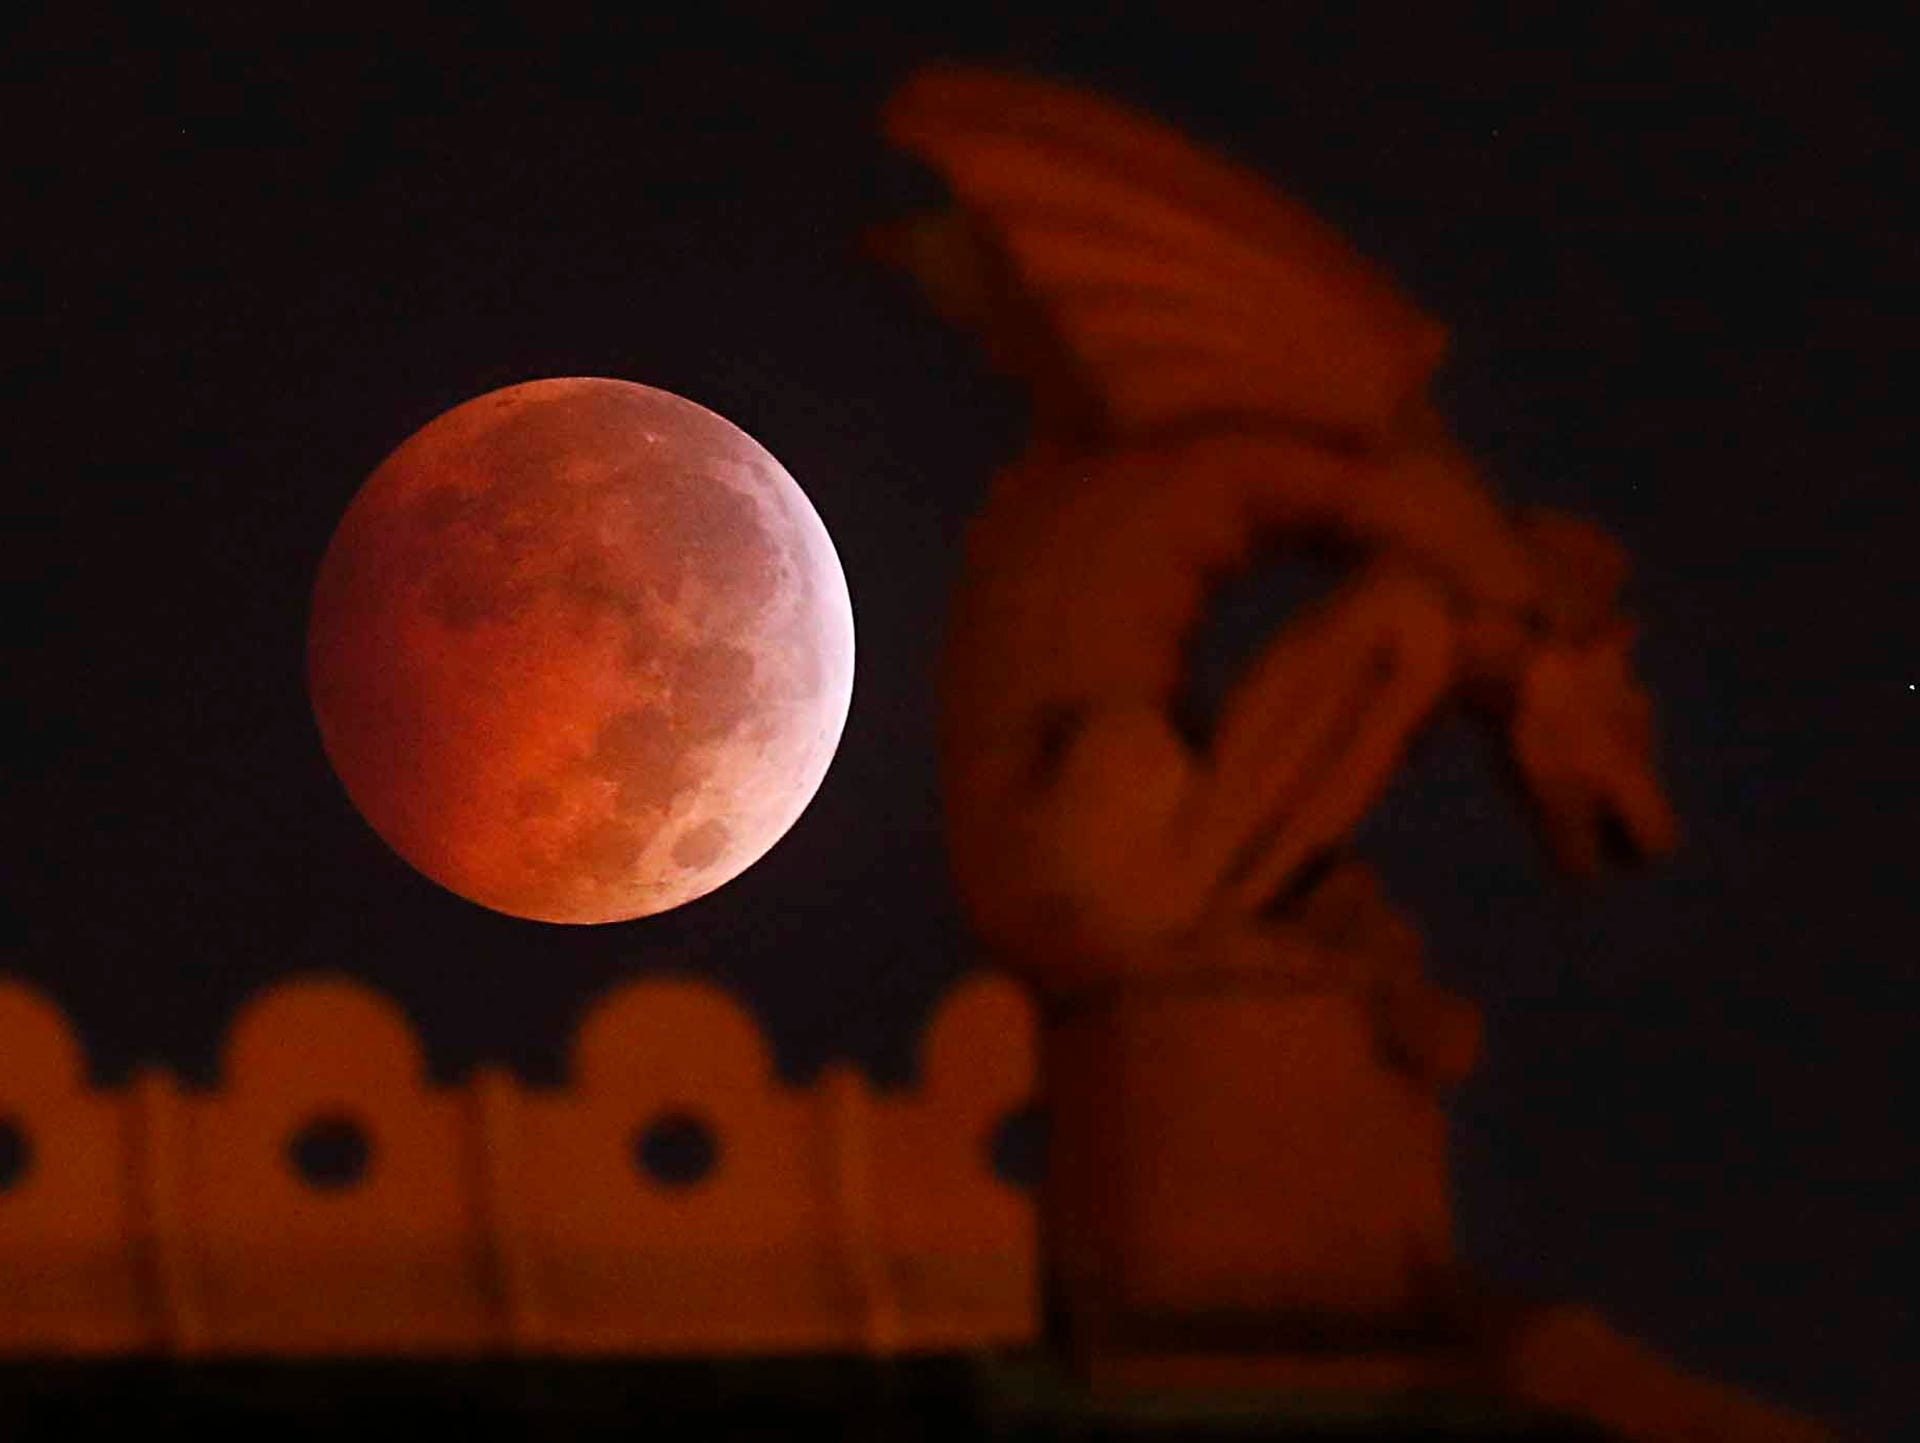 MOON NIGHT - Página 39 635483550895829041-AP-APTOPIX-Lunar-Eclipse